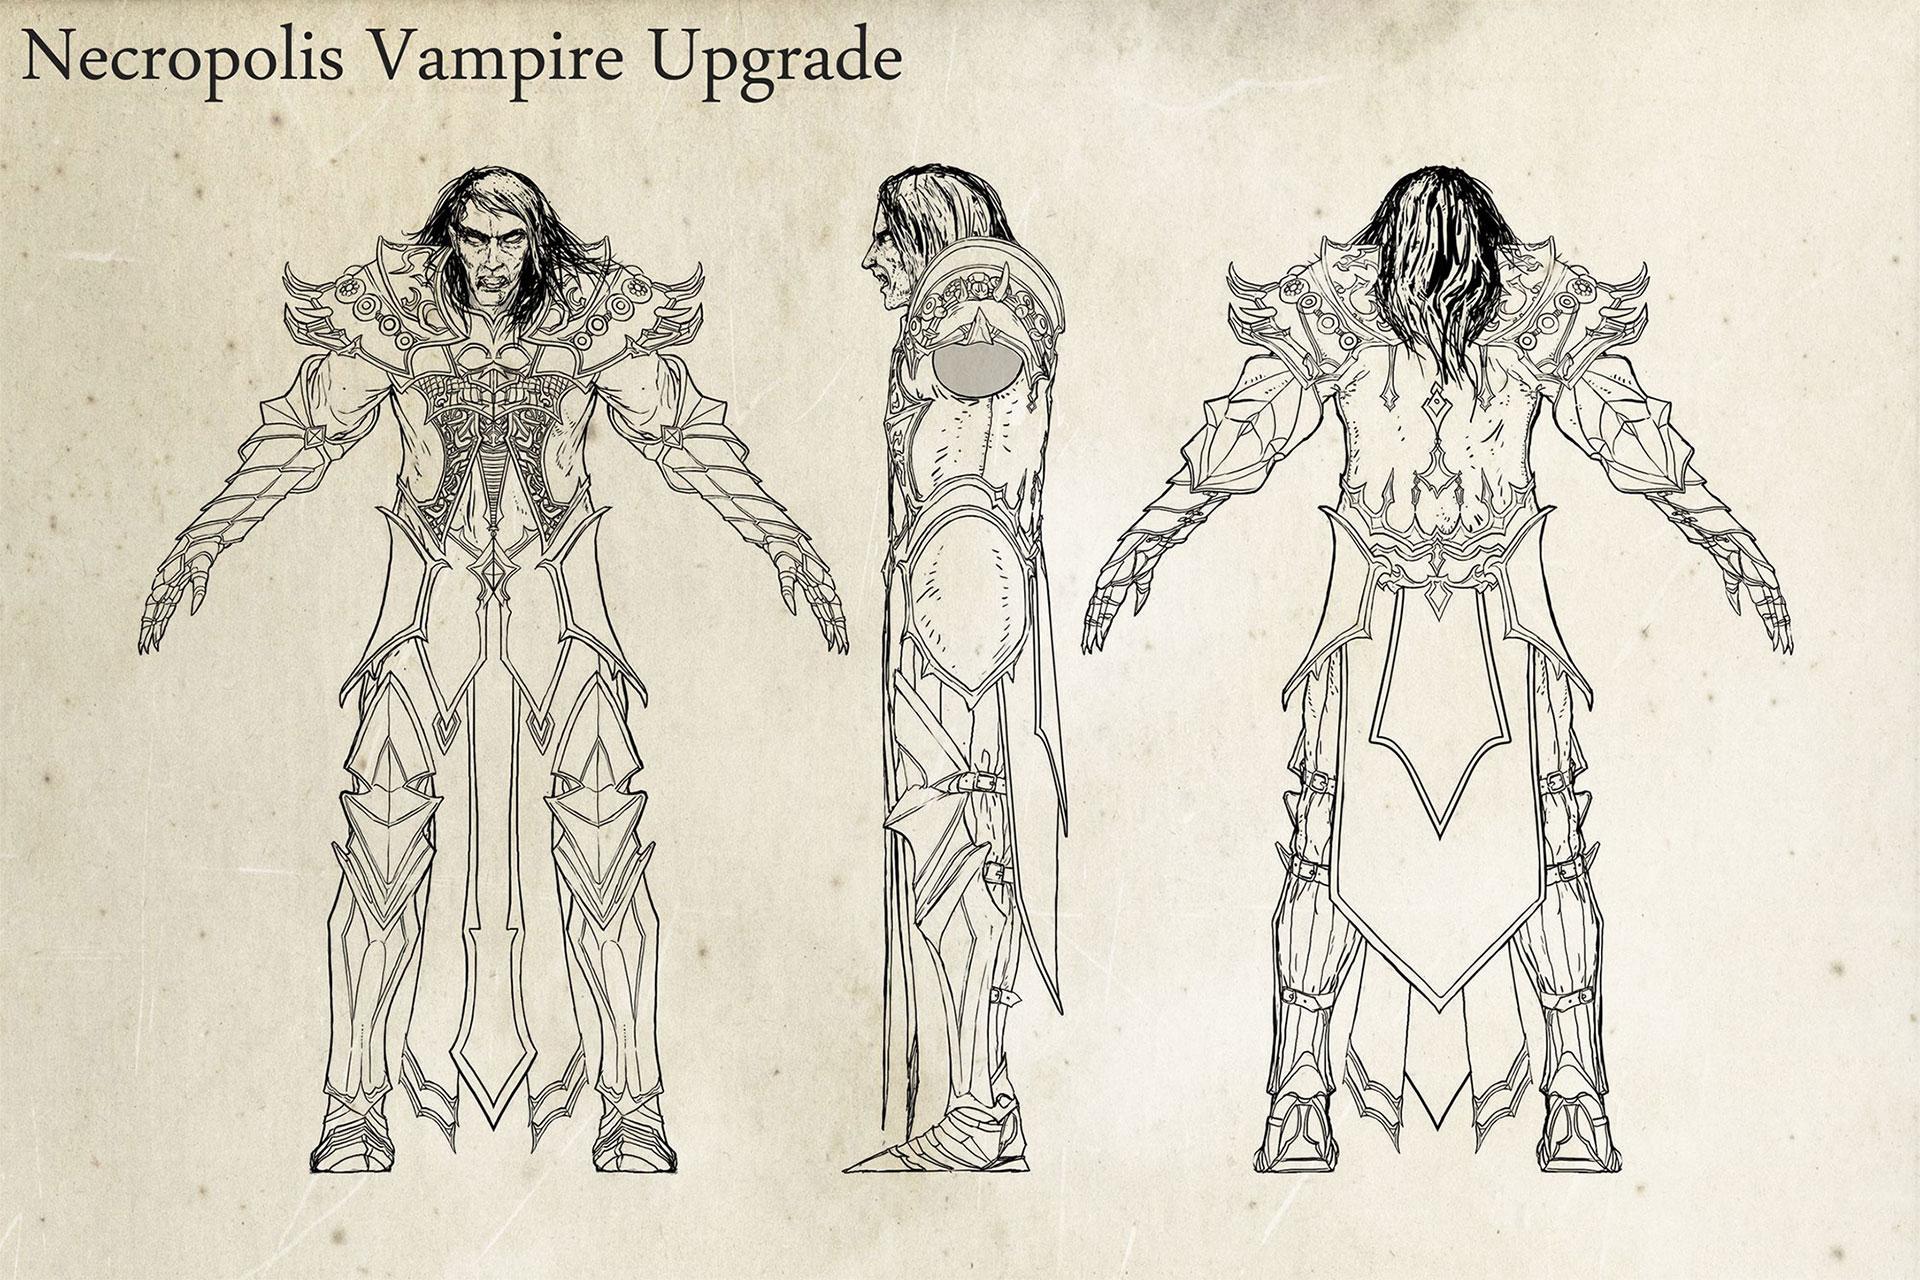 https://ubistatic-a.akamaihd.net/0004/prod/images/150722_cbe6ce5c83/Necro_Vampire_Upg_T.jpg